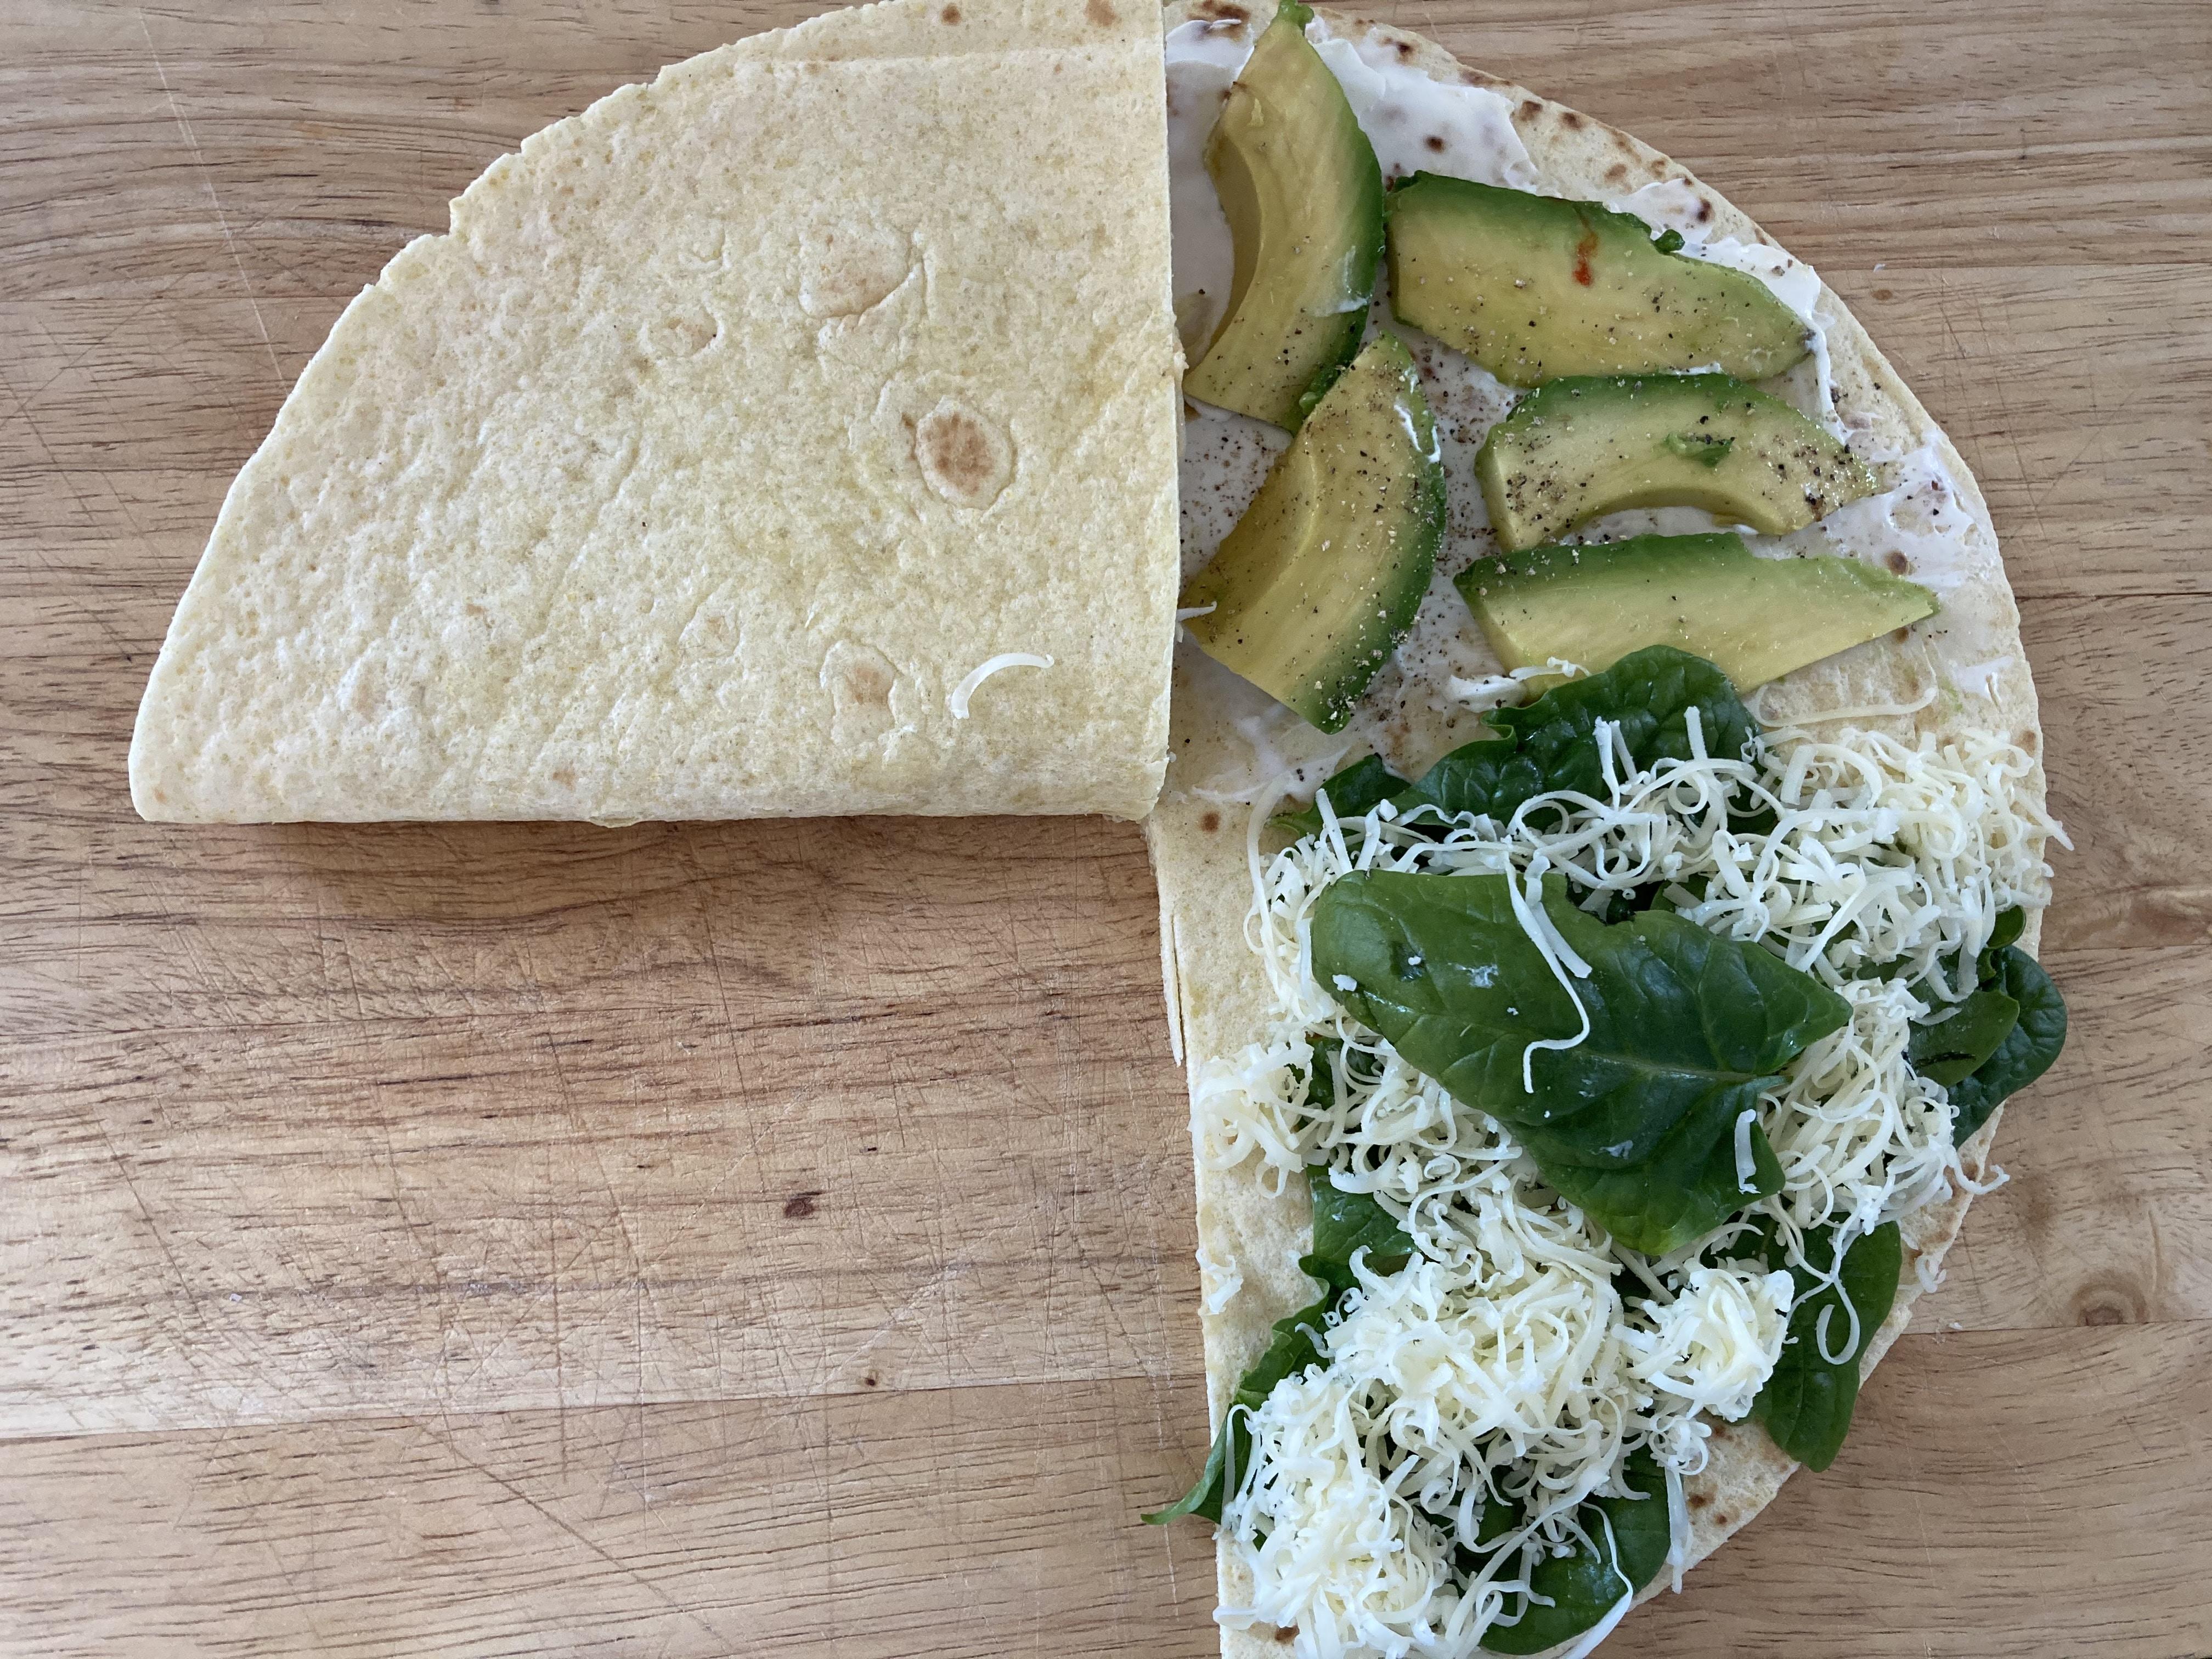 Wrap gefaltet: Avocado, Käse / snackconnection